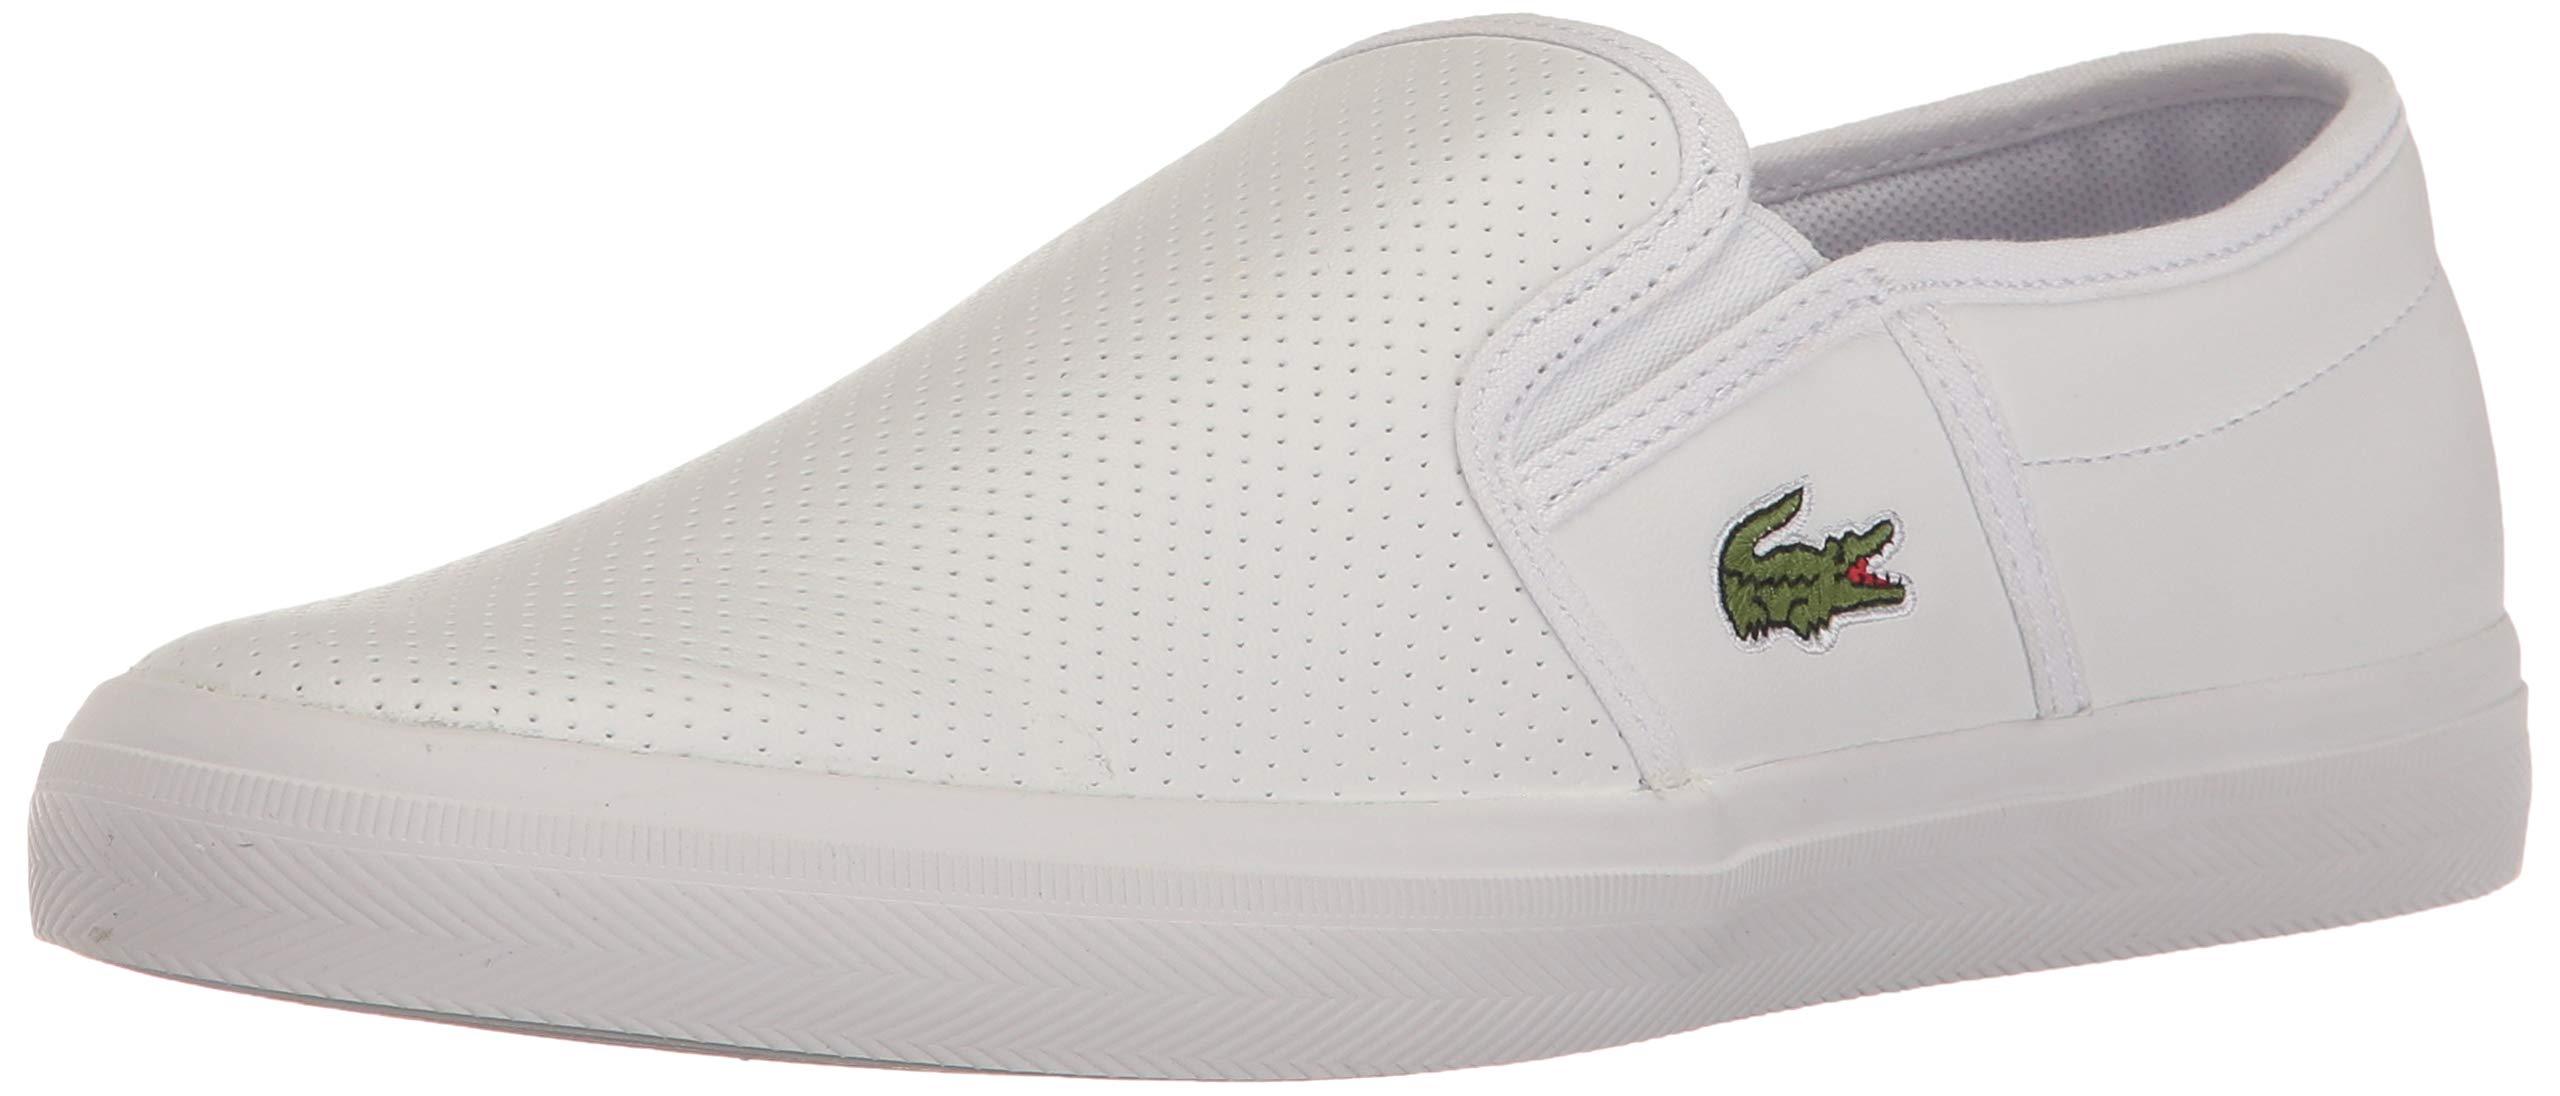 Lacoste Mens Gazon Bl 1 Sneaker